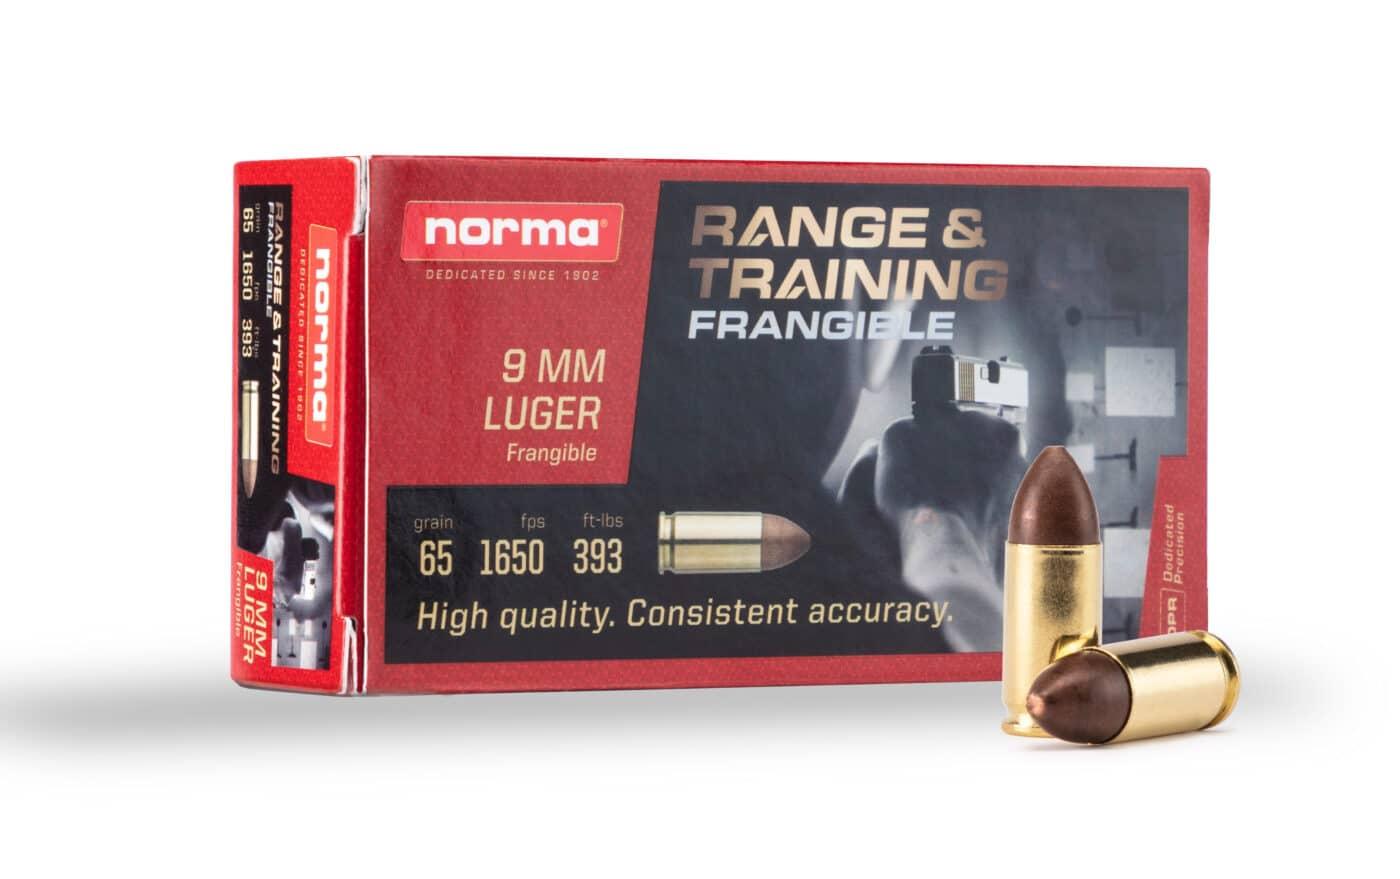 Normal frangible training ammunition and box